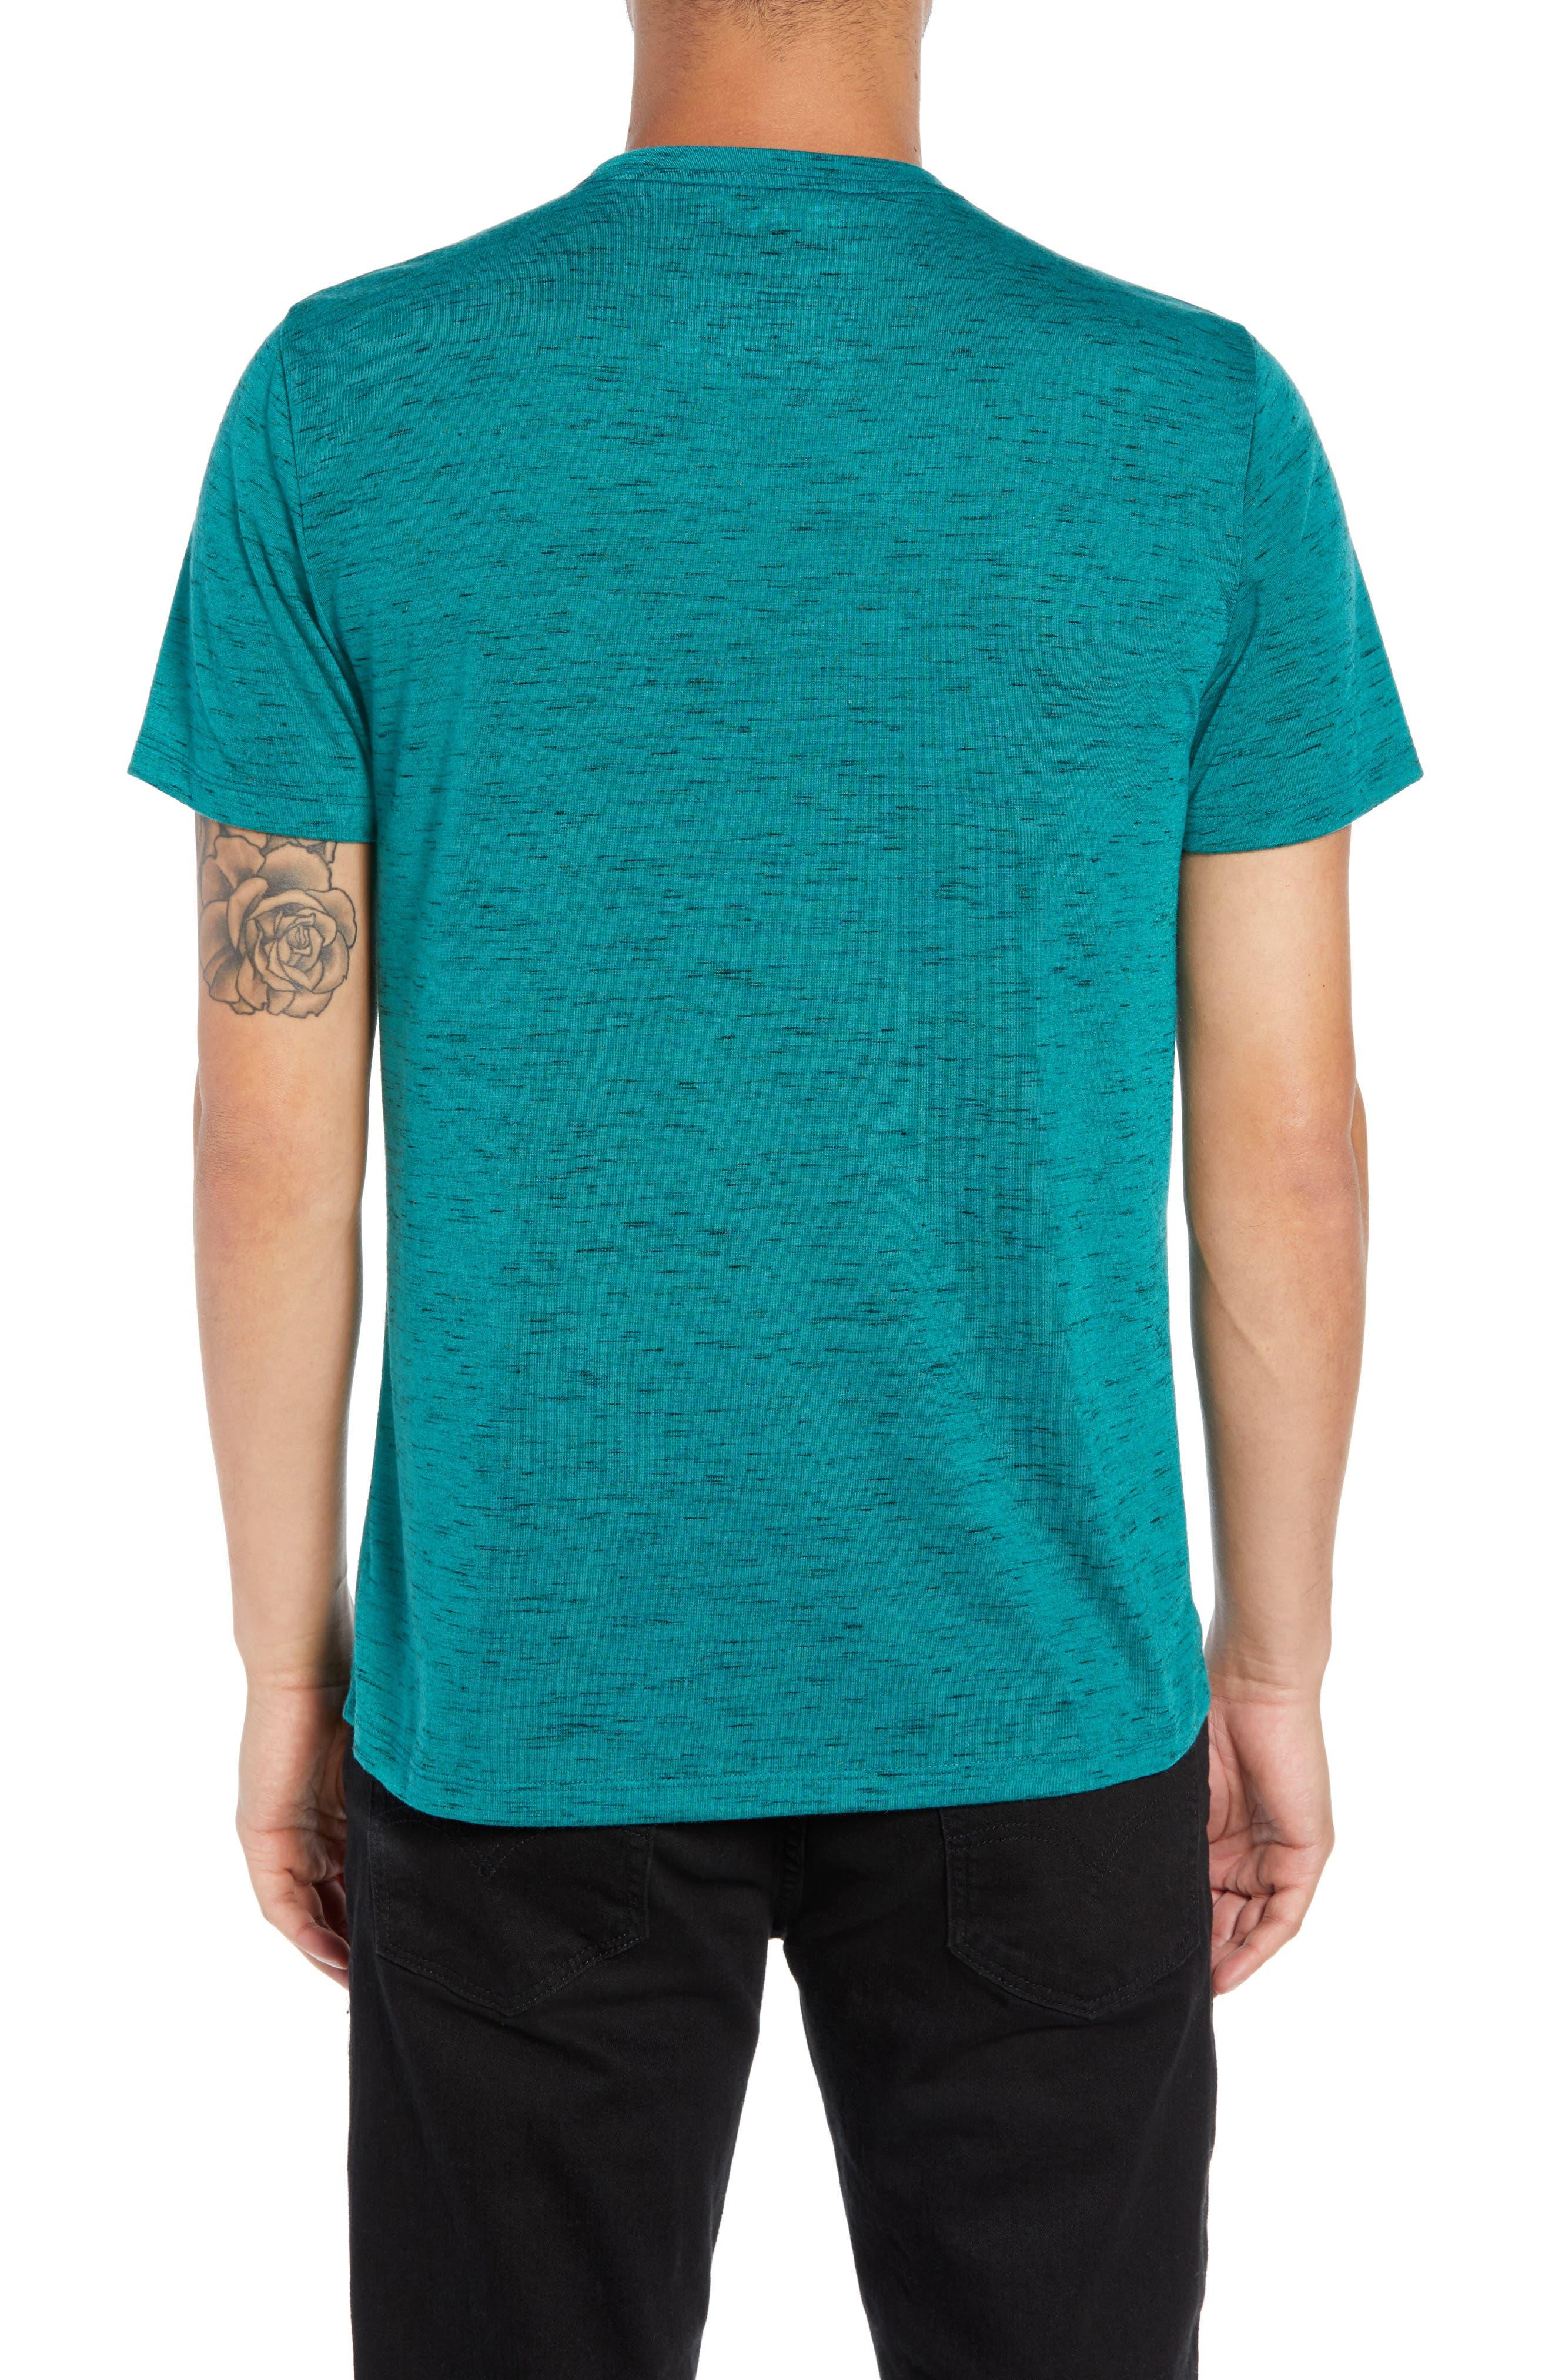 Streaky T-Shirt,                             Alternate thumbnail 2, color,                             TEAL GREEN- BLACK